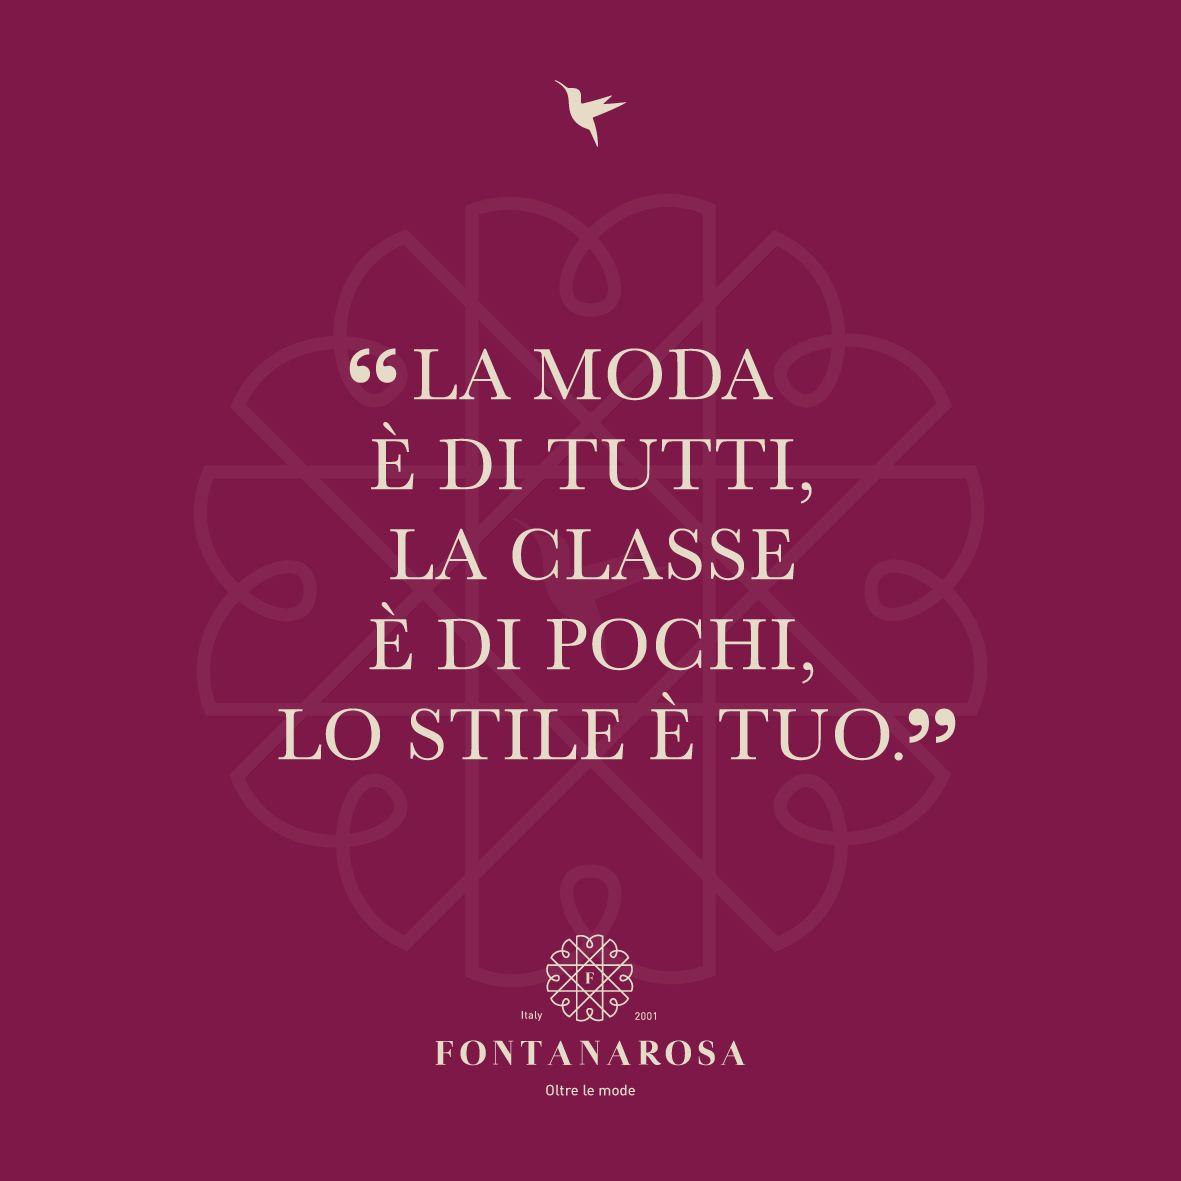 Frasi Sulla Classe E Stile